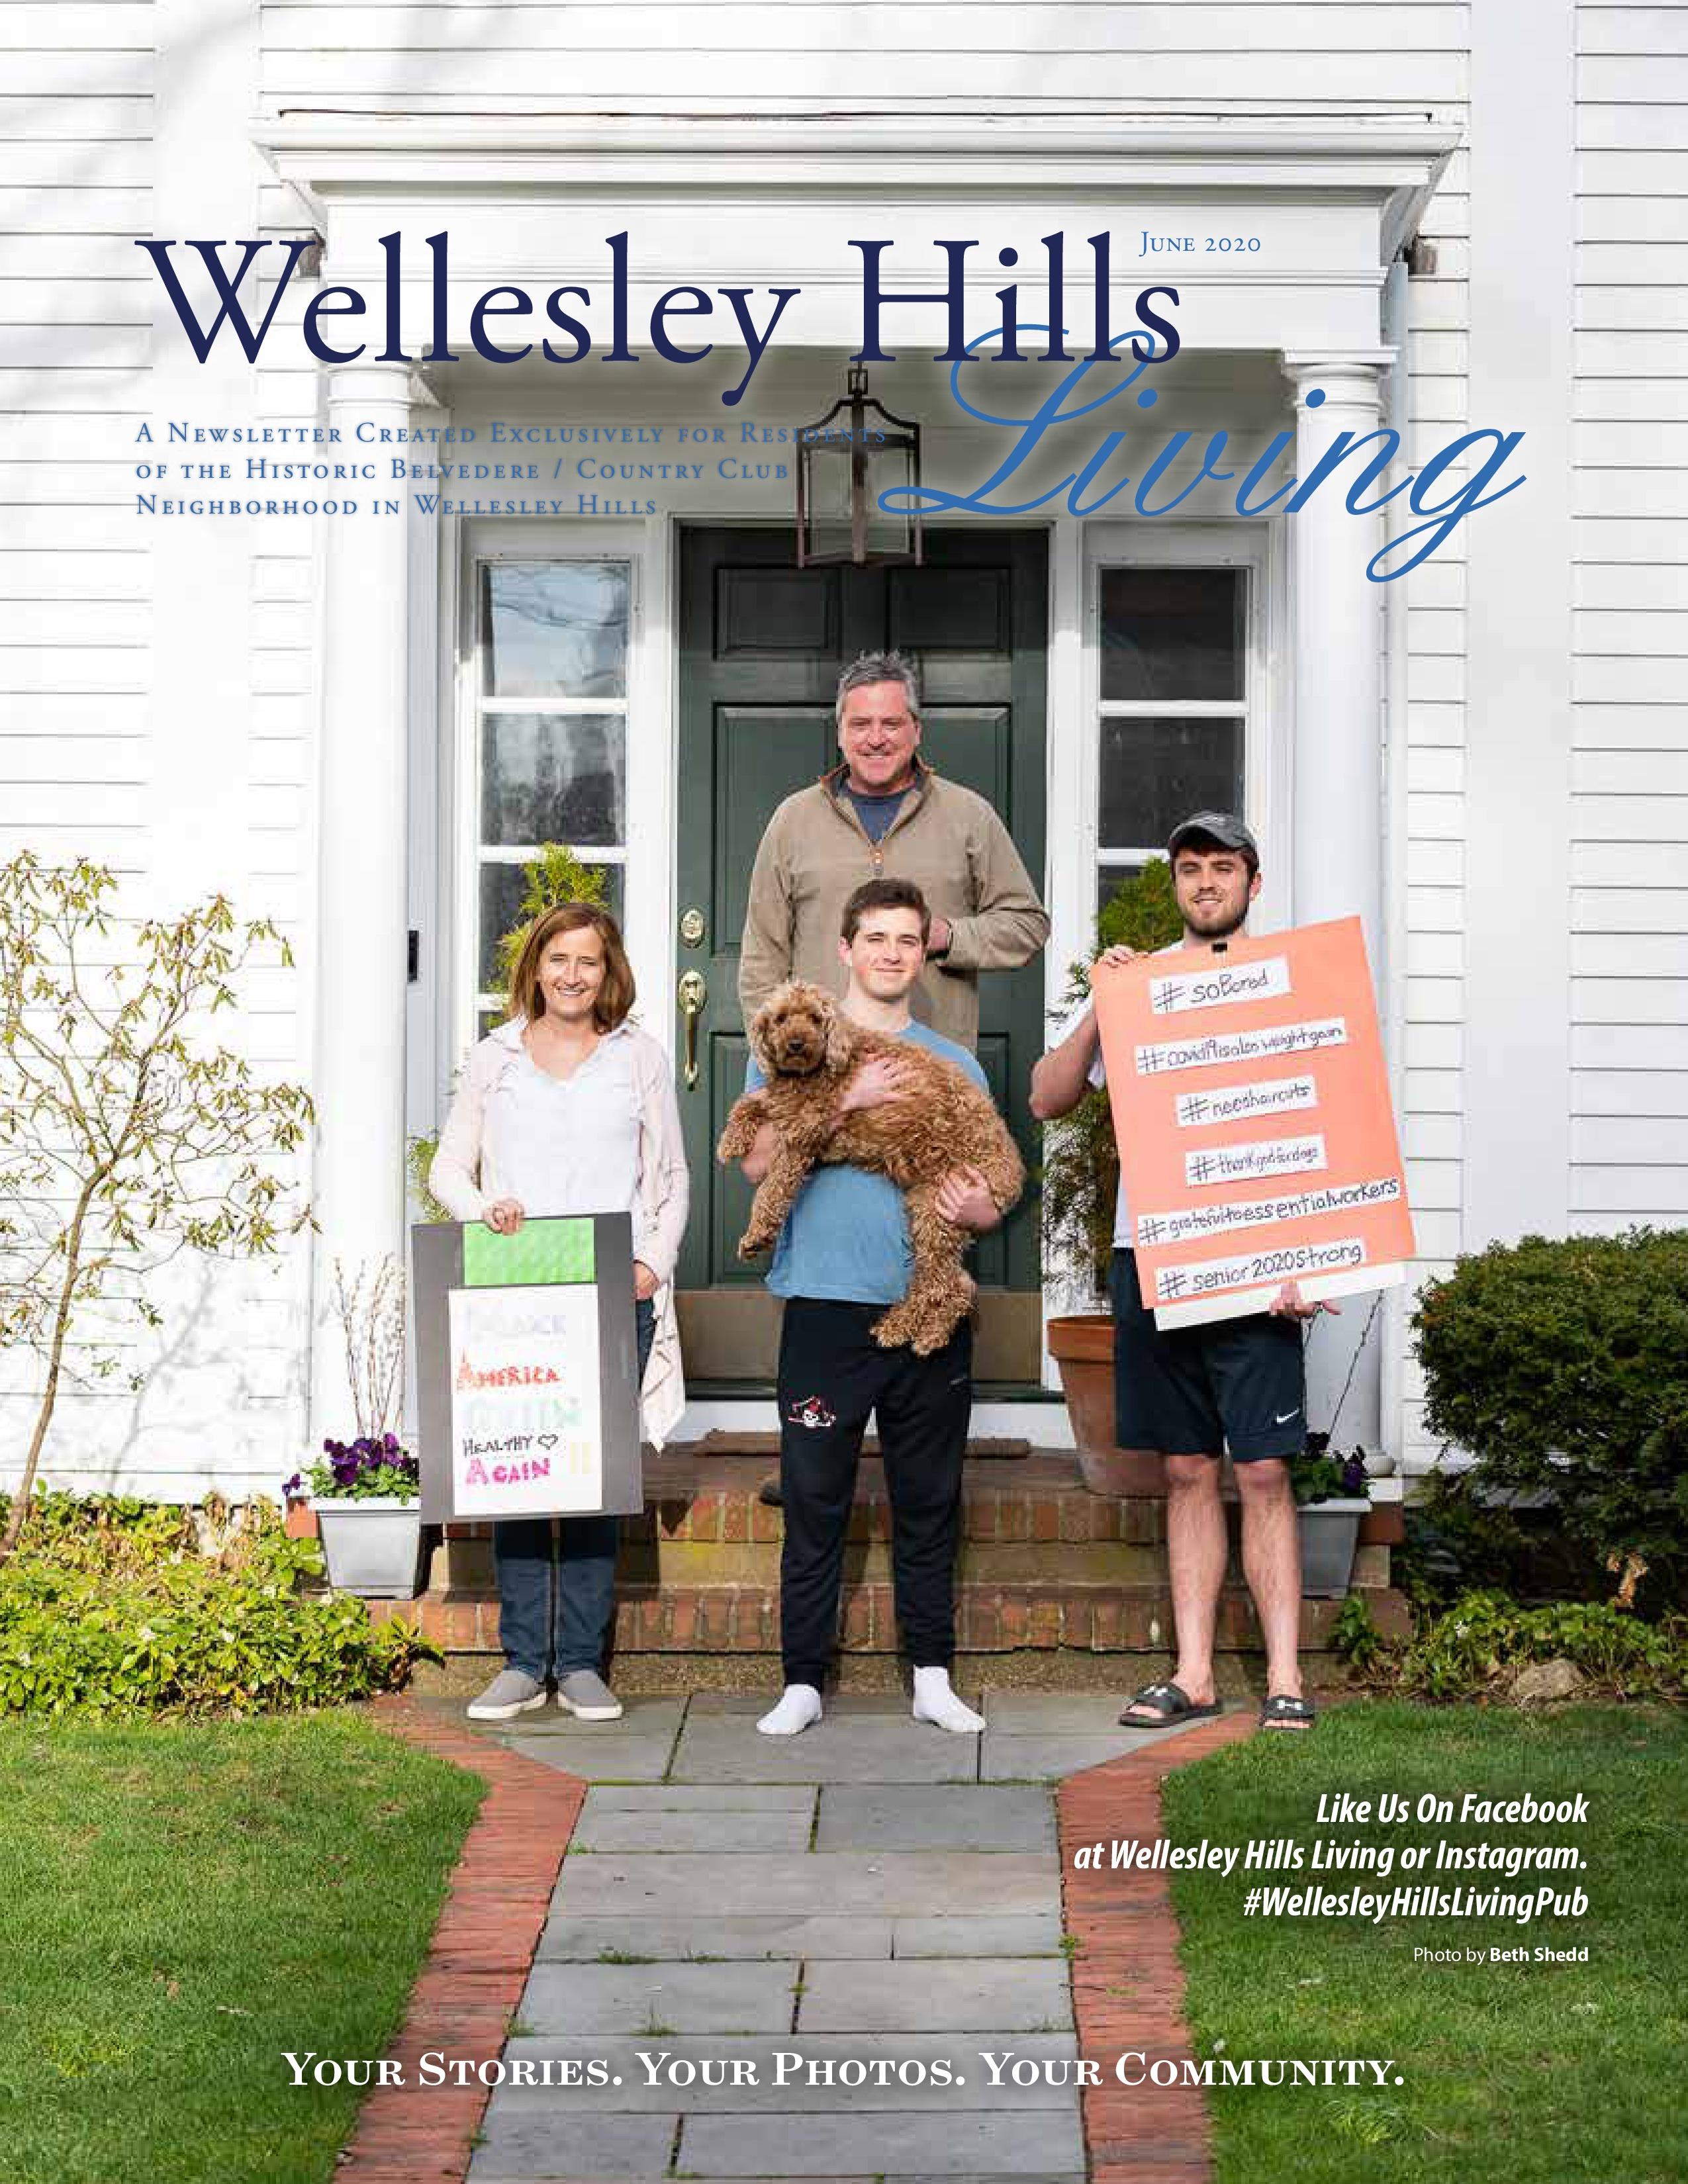 Jun 2020 wellesley hills living page 1